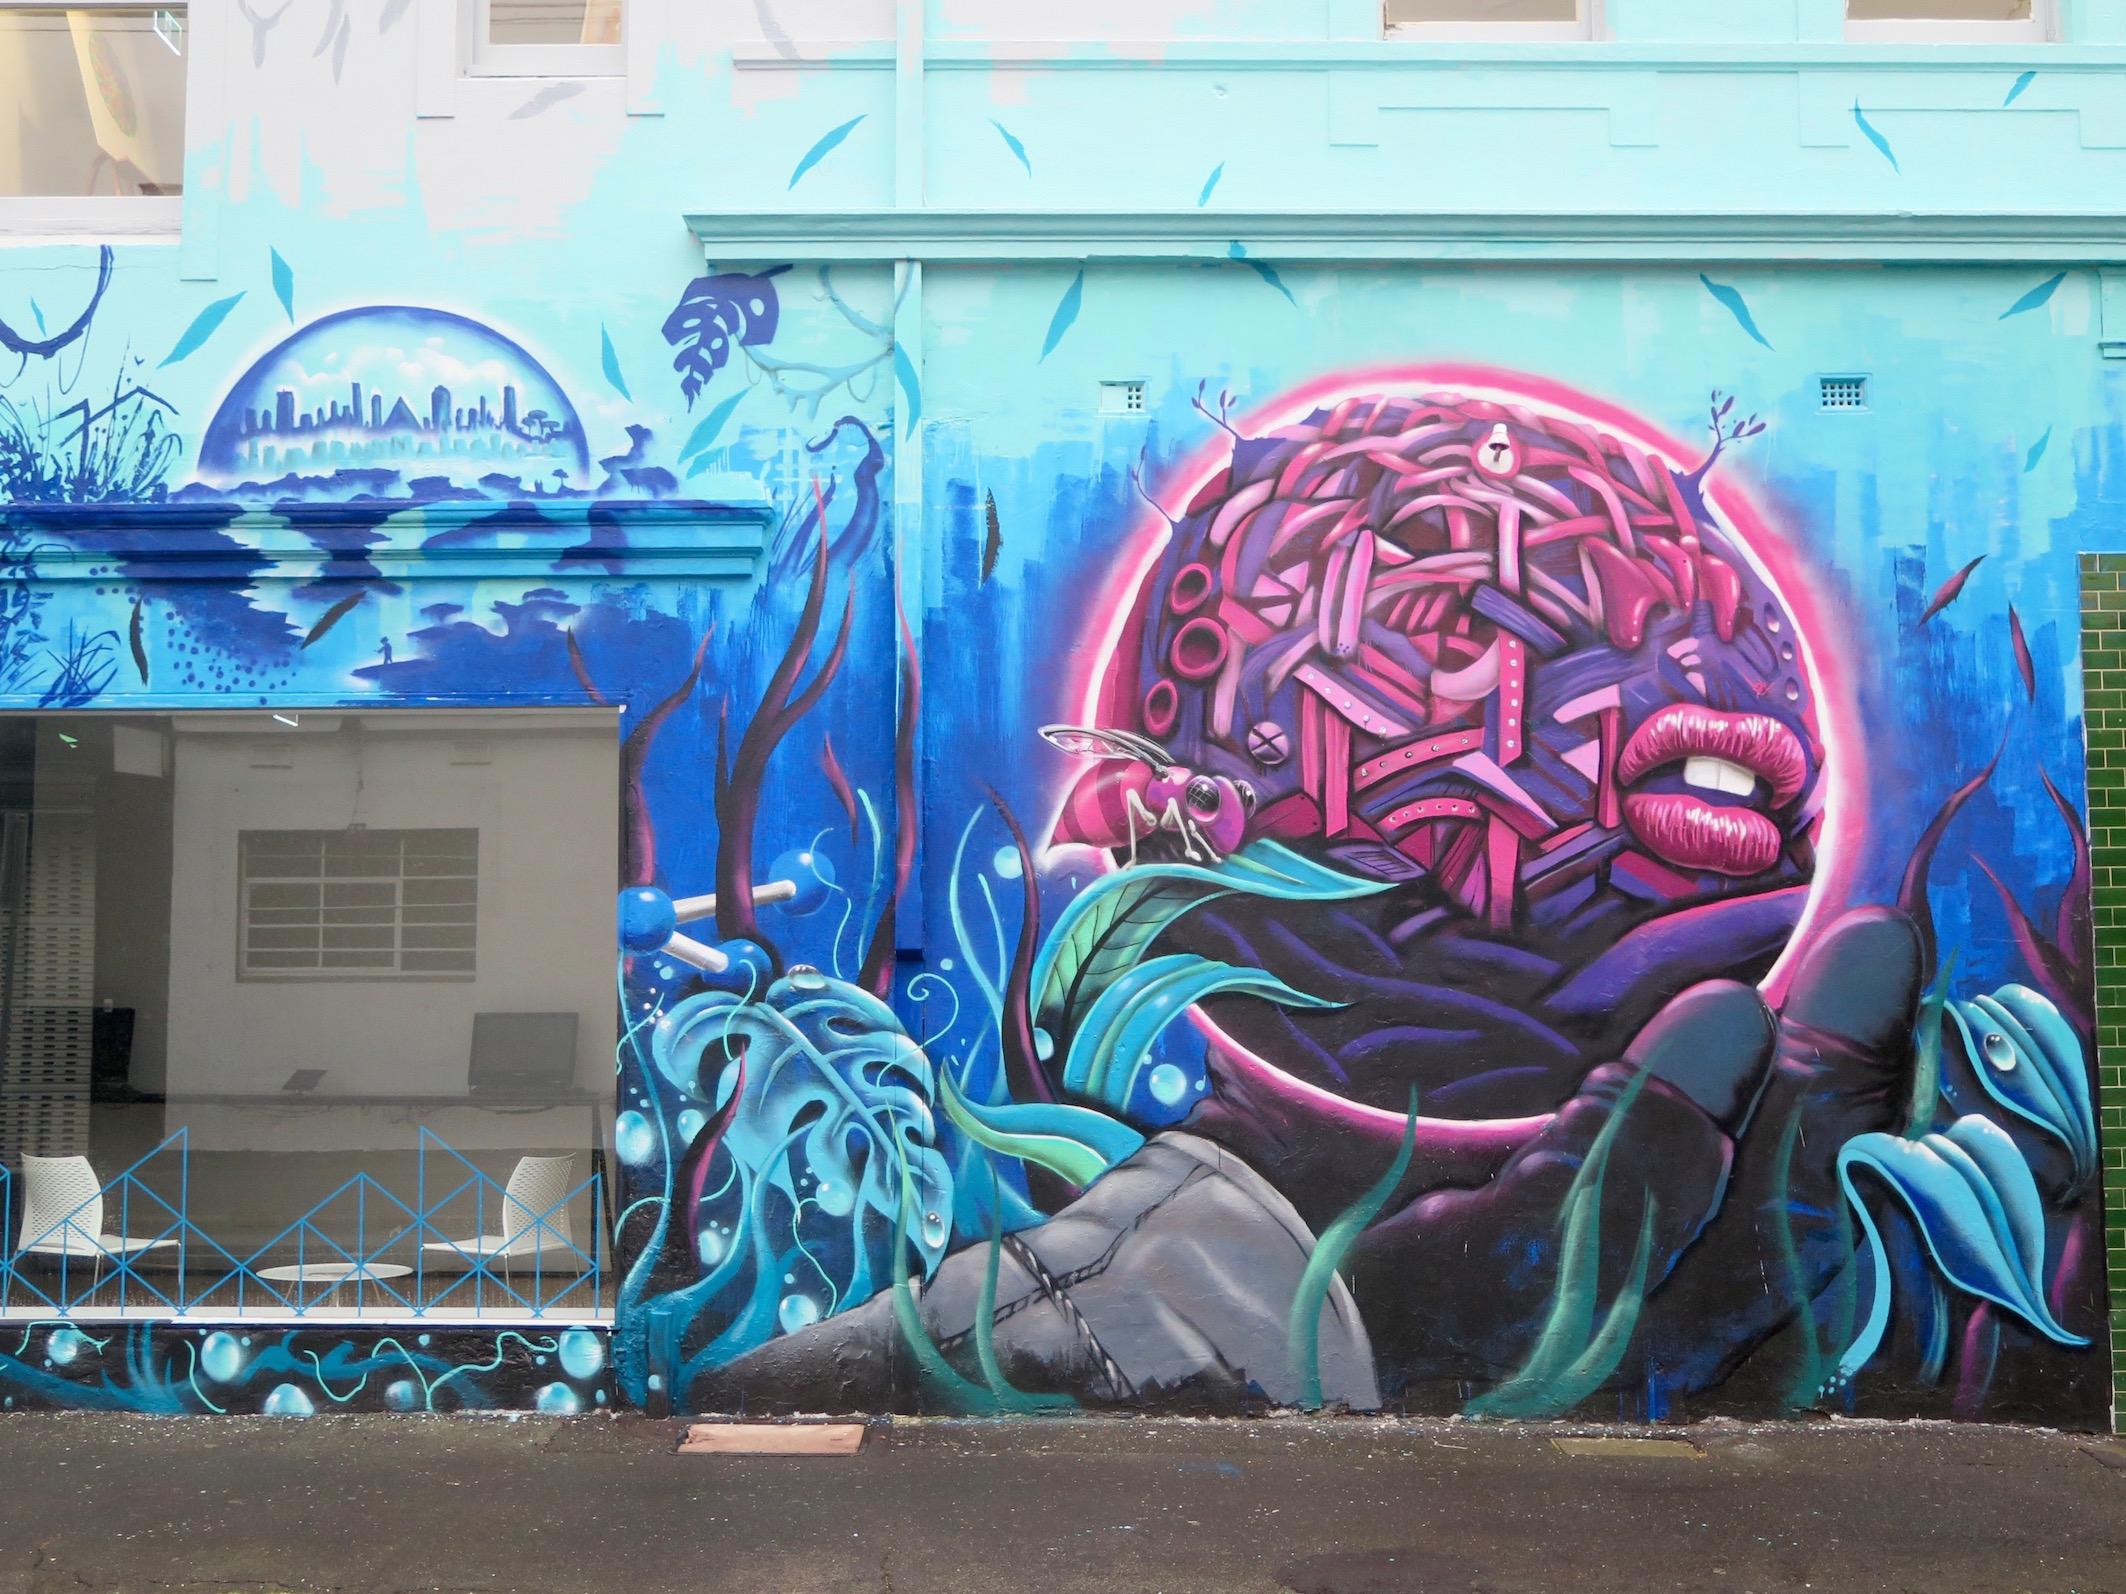 deansunshine_landofsunshine_melbourne_streetart_graffiti_melb-polytechnic-makatron-cam_scale-4